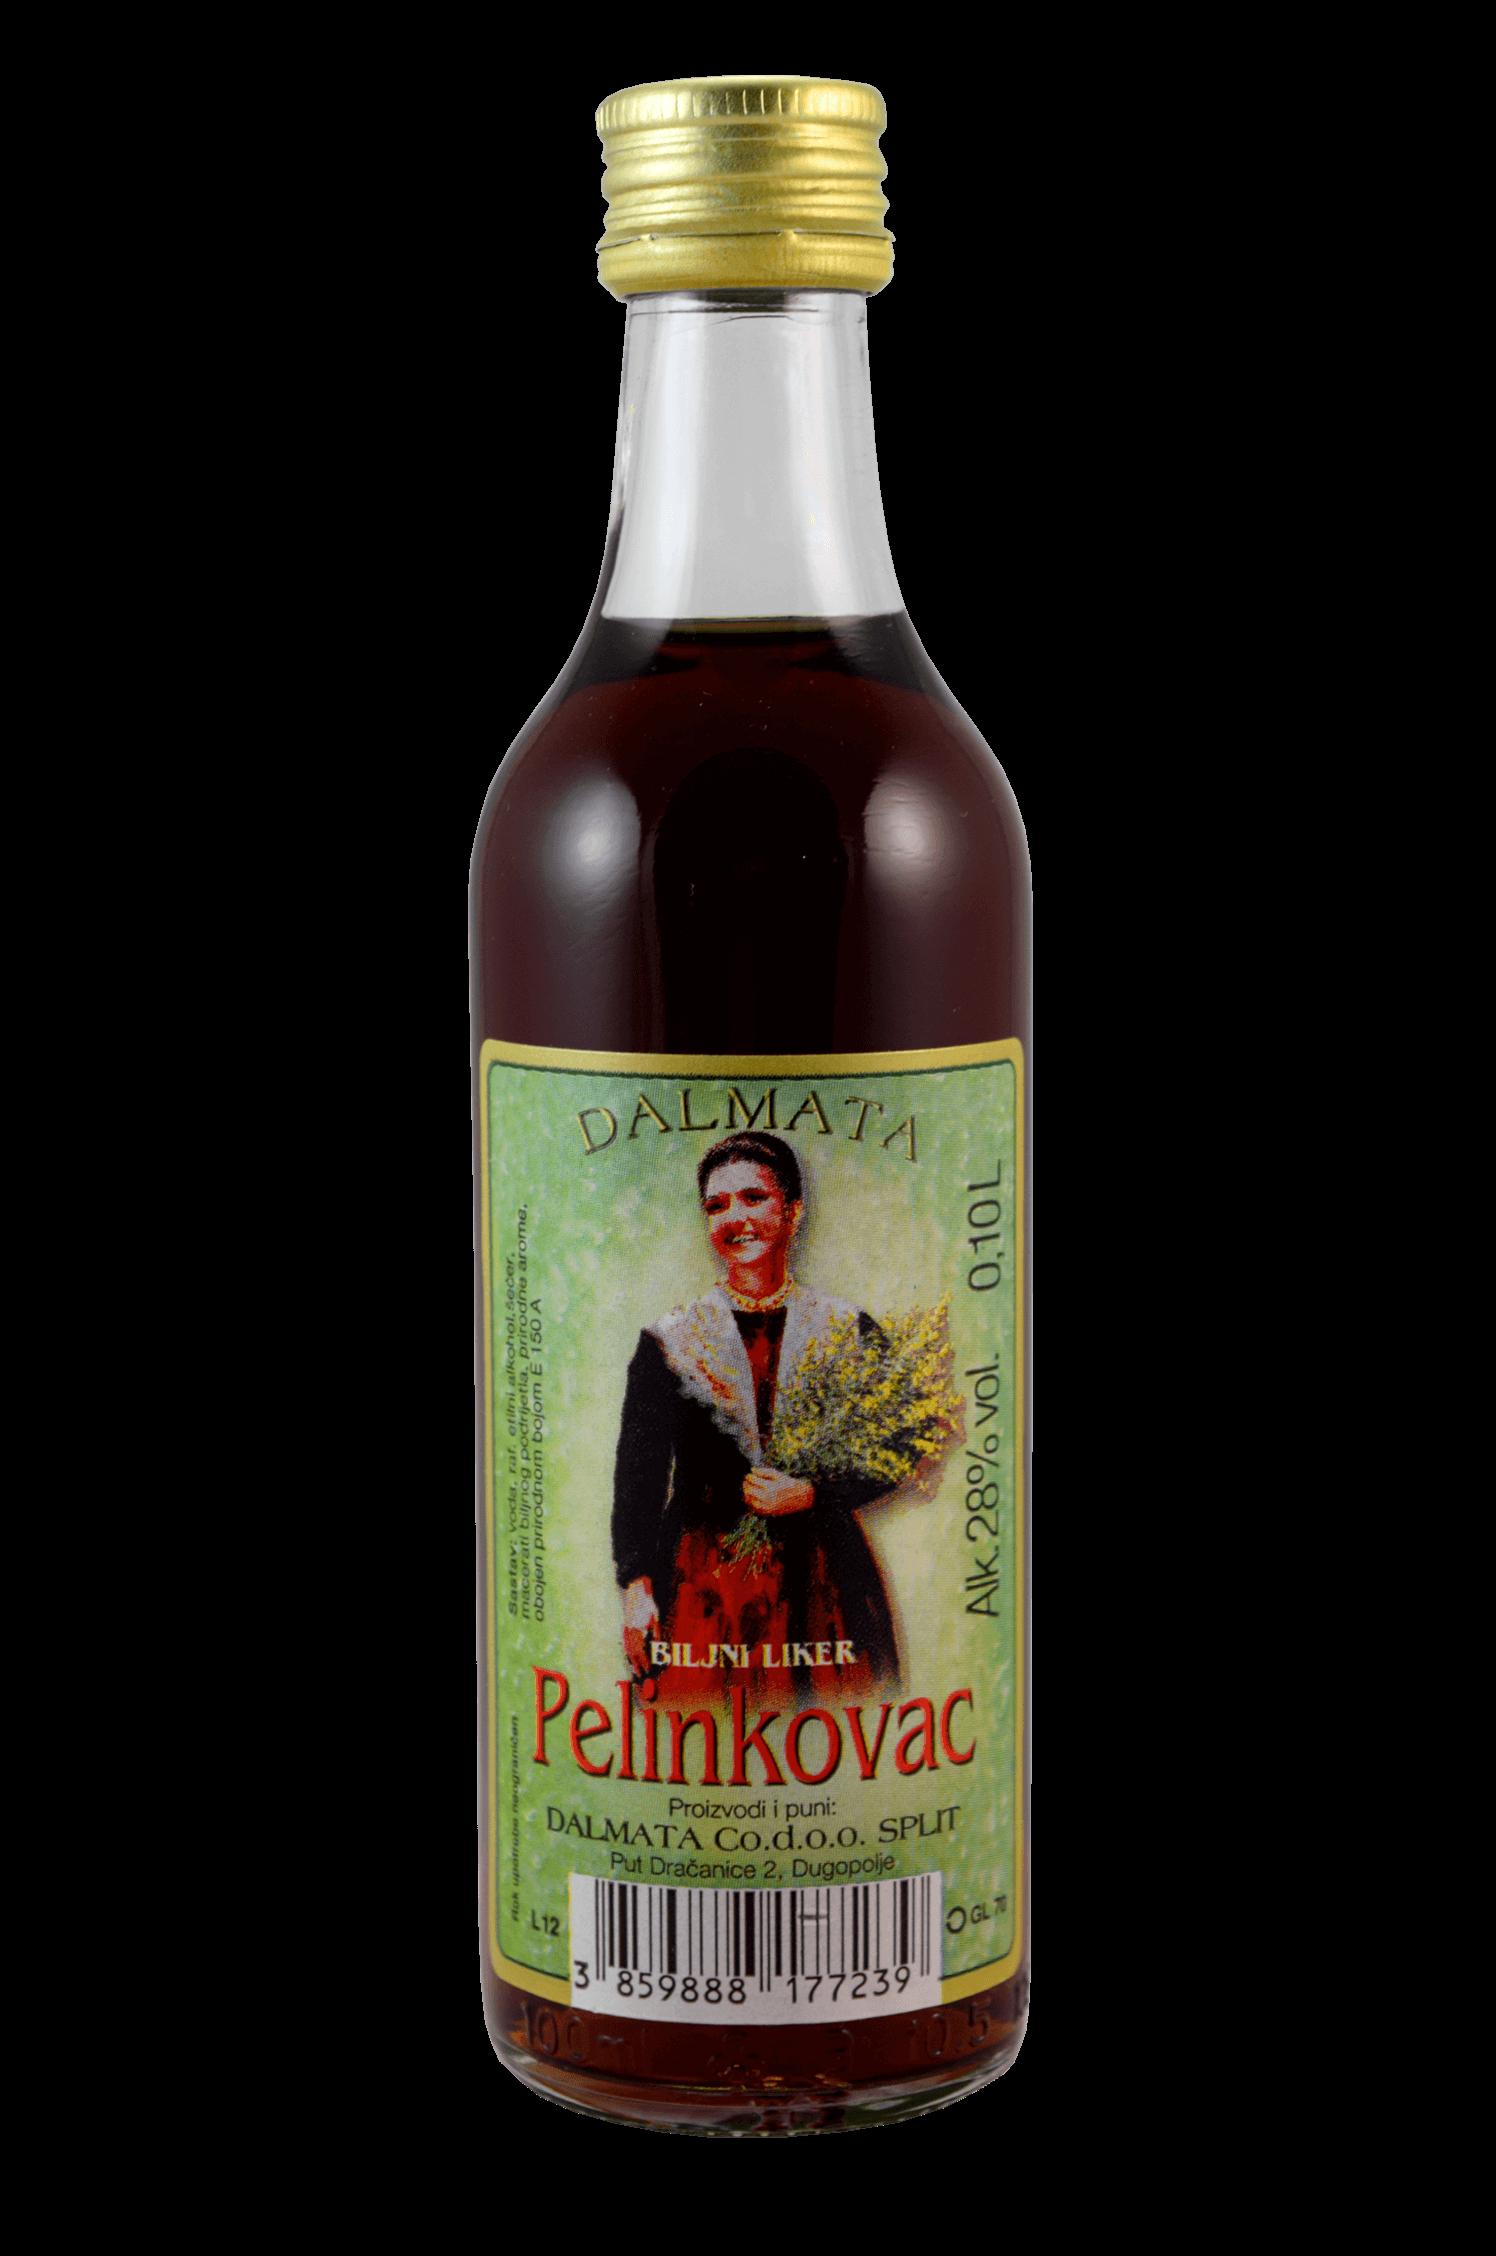 Dalmata Pelinkovac